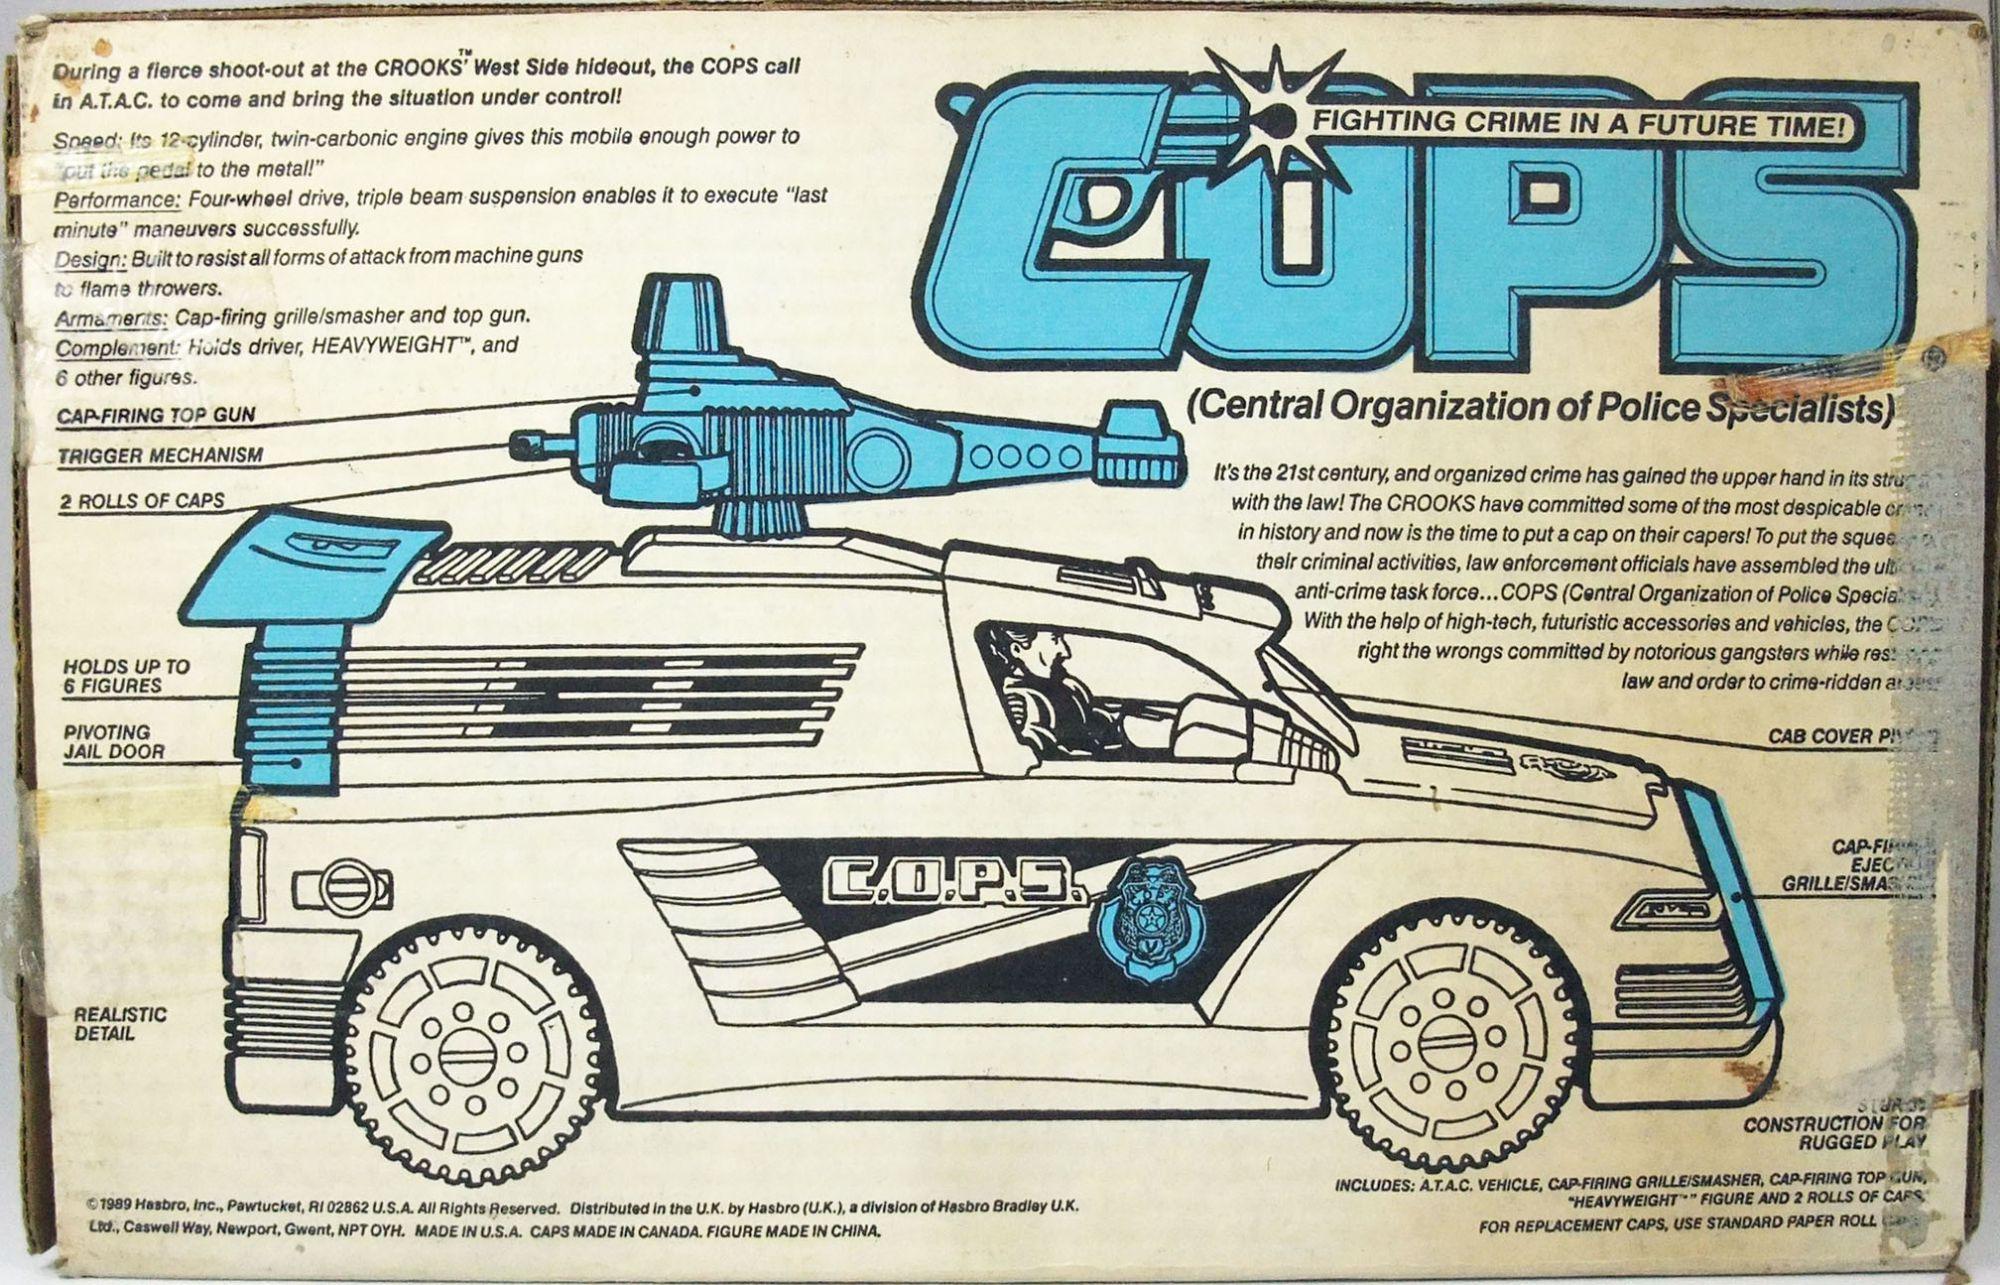 C.O.P.S. & Crooks - A.T.A.C. Armored Tactical Assault Car